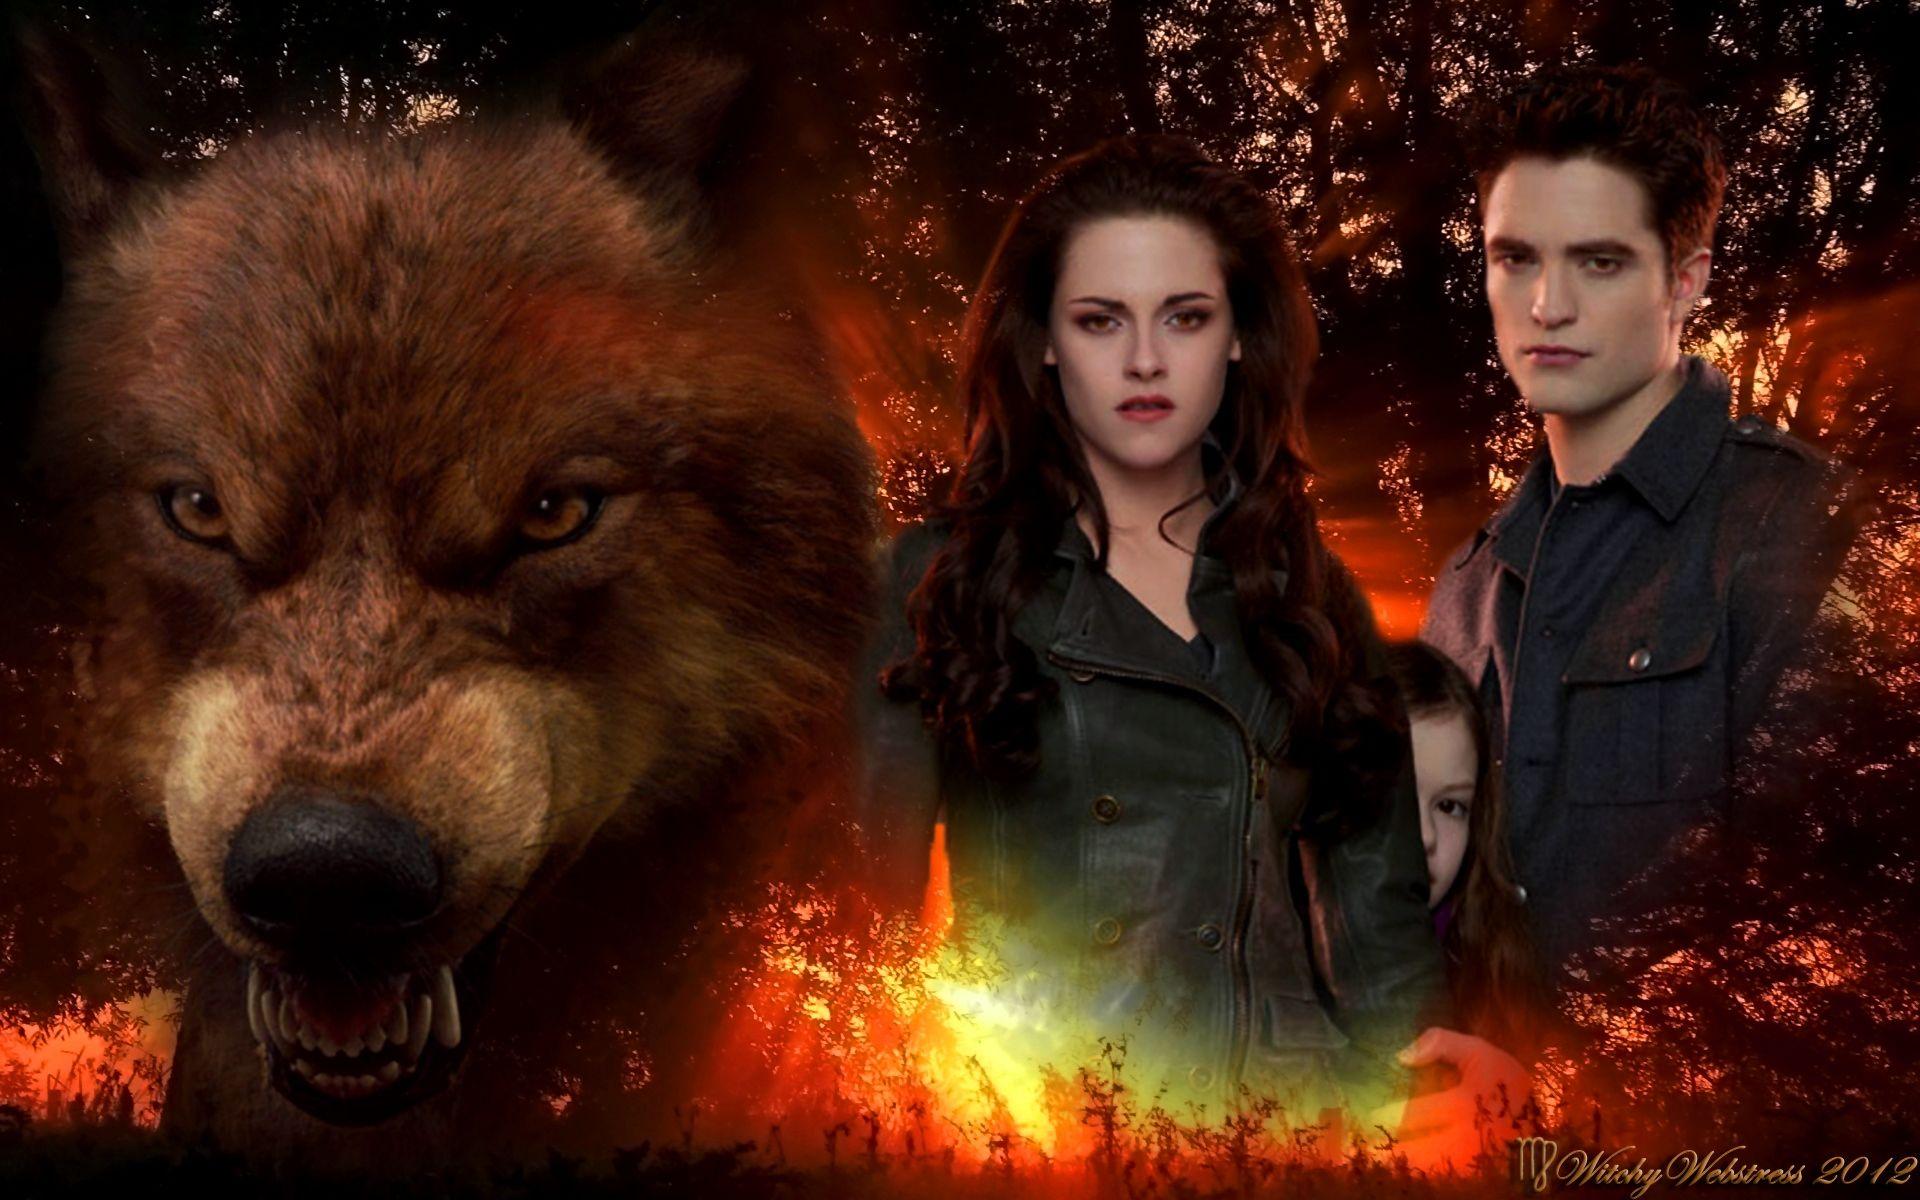 ♥ Jacob Protects Renesmee - Bella & Edward ♥ | Twilight